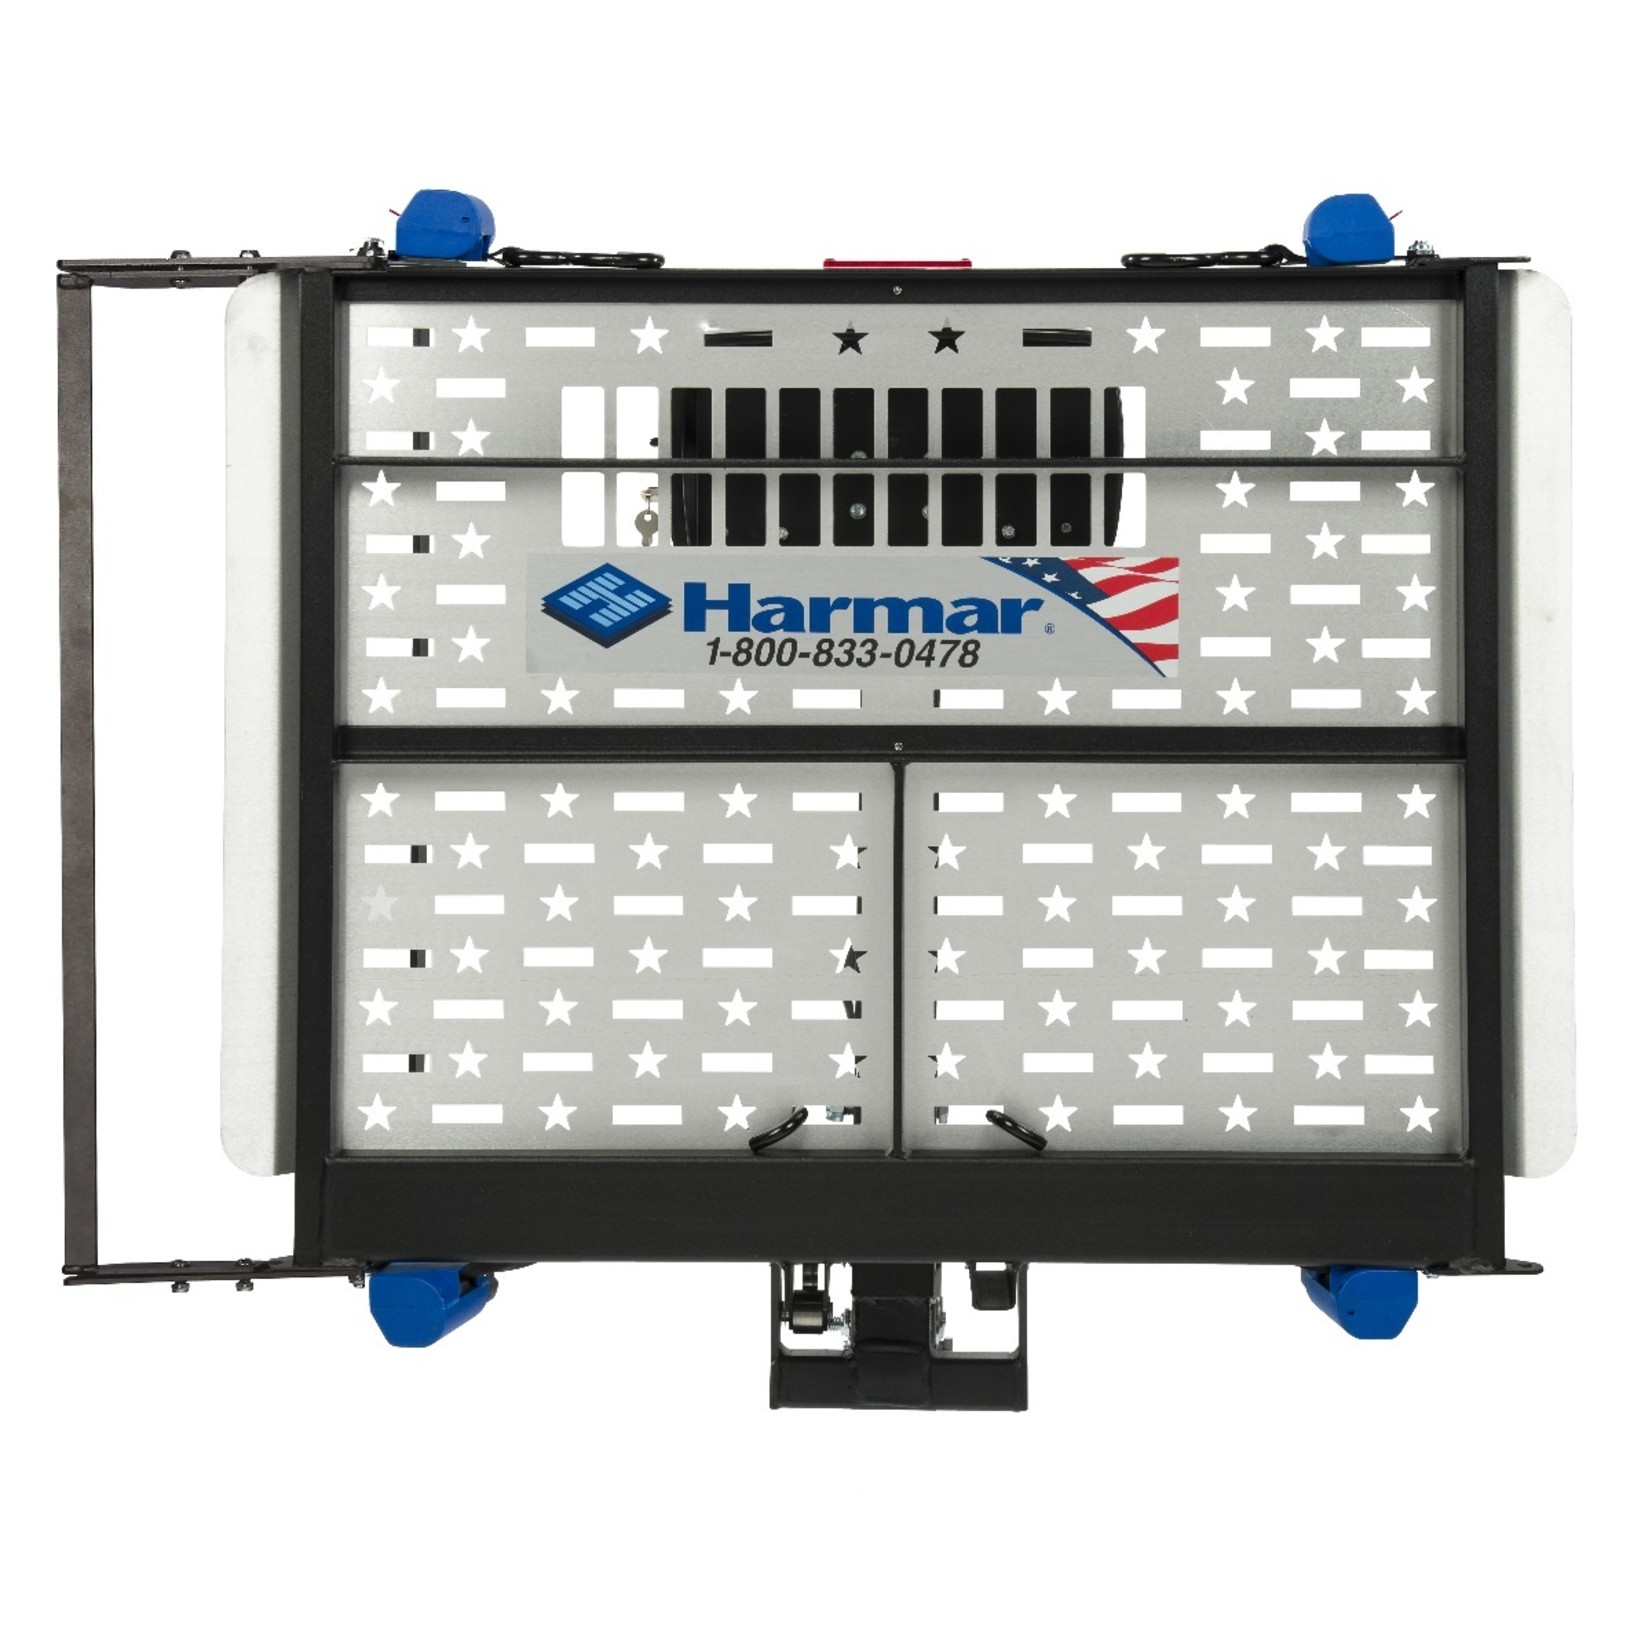 Harmar Mobility AL301XL Extra Large Fusion Lift